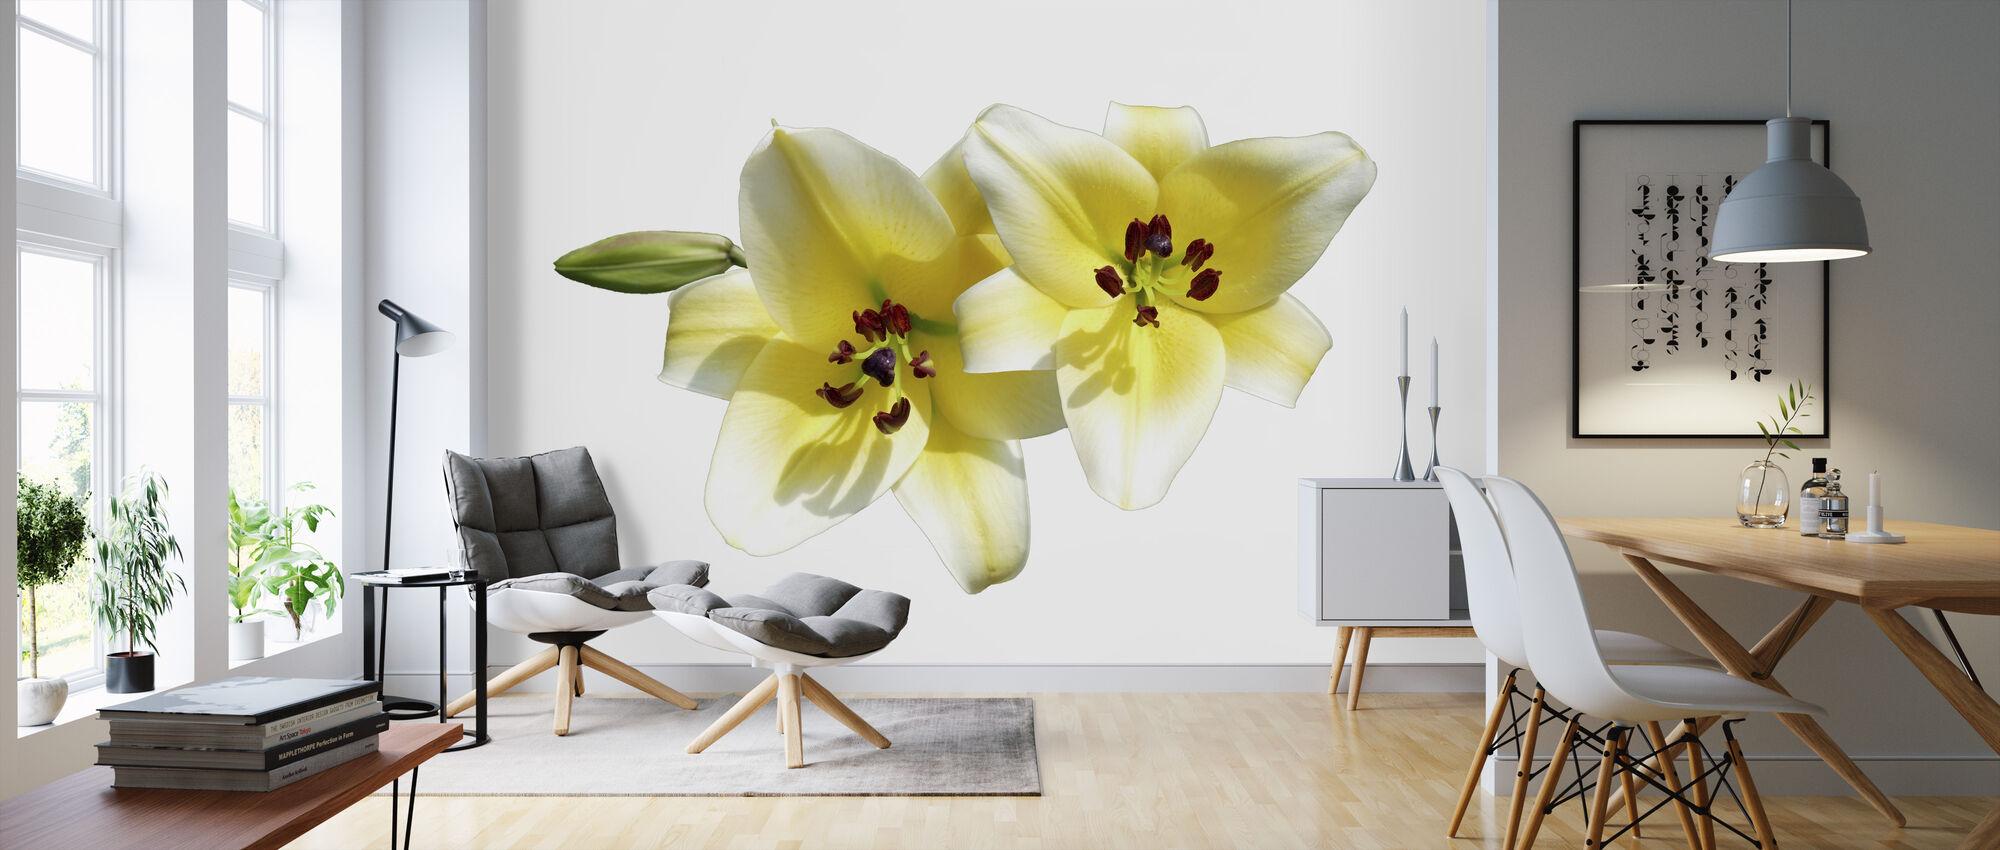 Lilies Flower - Wallpaper - Living Room